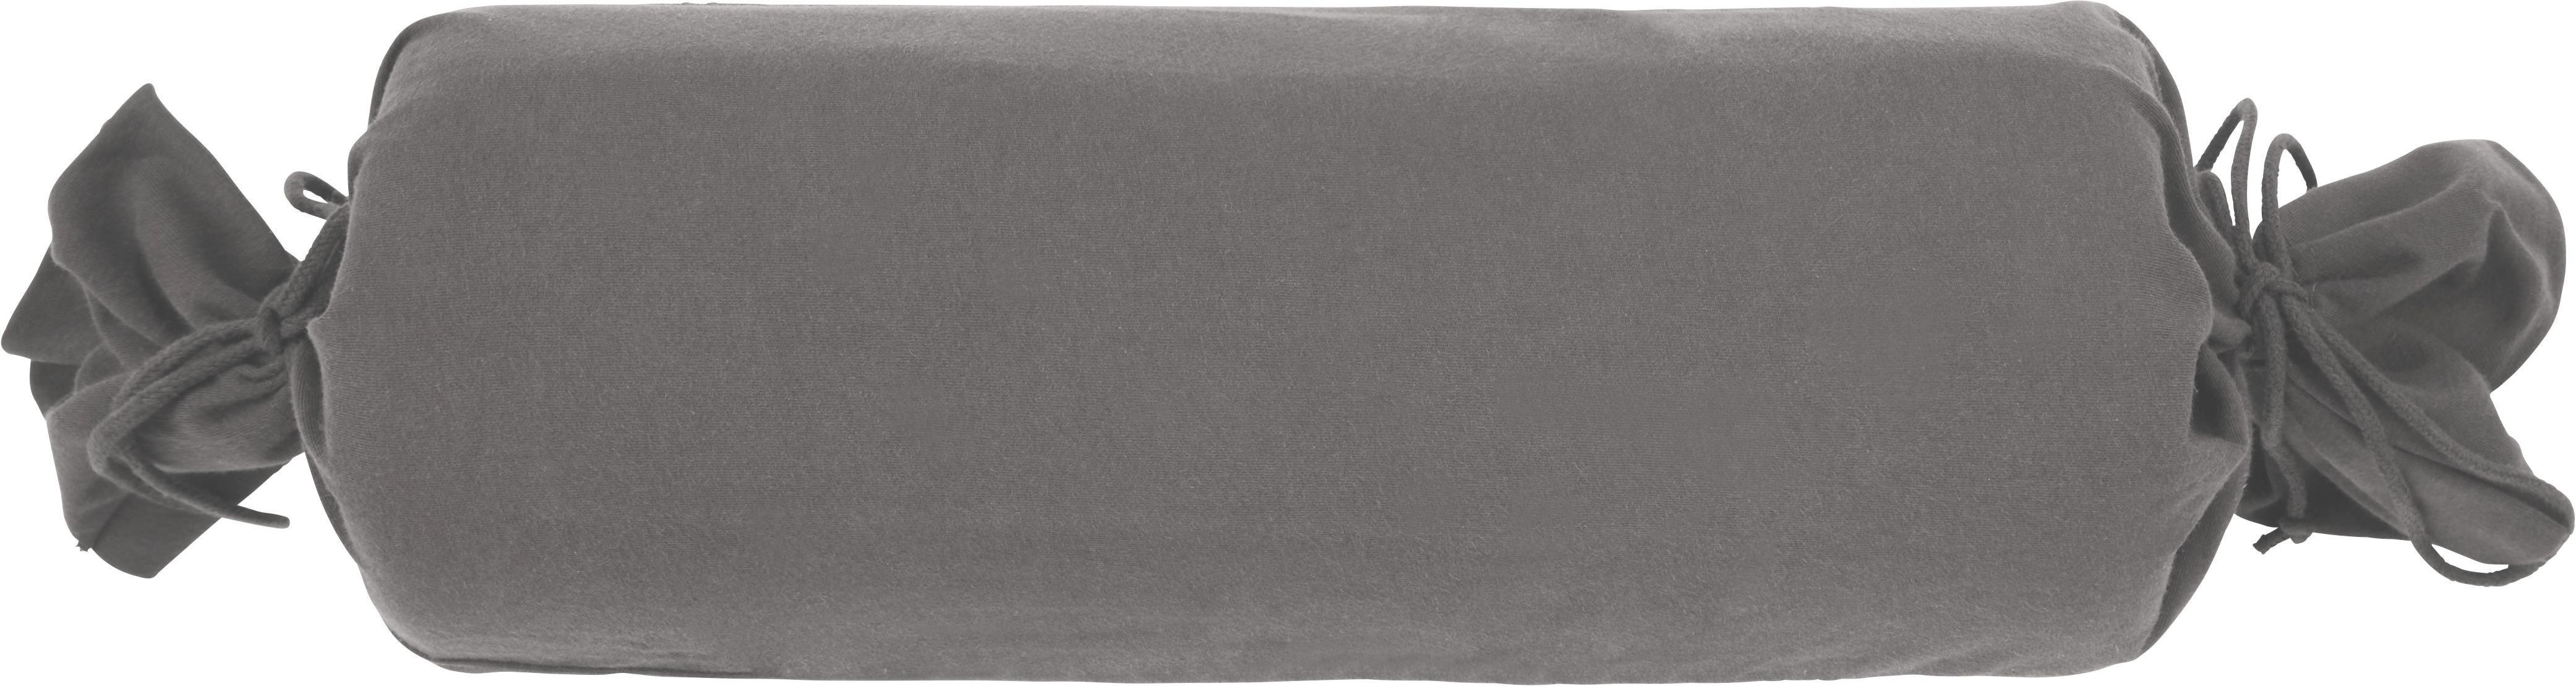 Povlak Na Polštář Basic - šedá, textil (15/40cm) - MÖMAX modern living